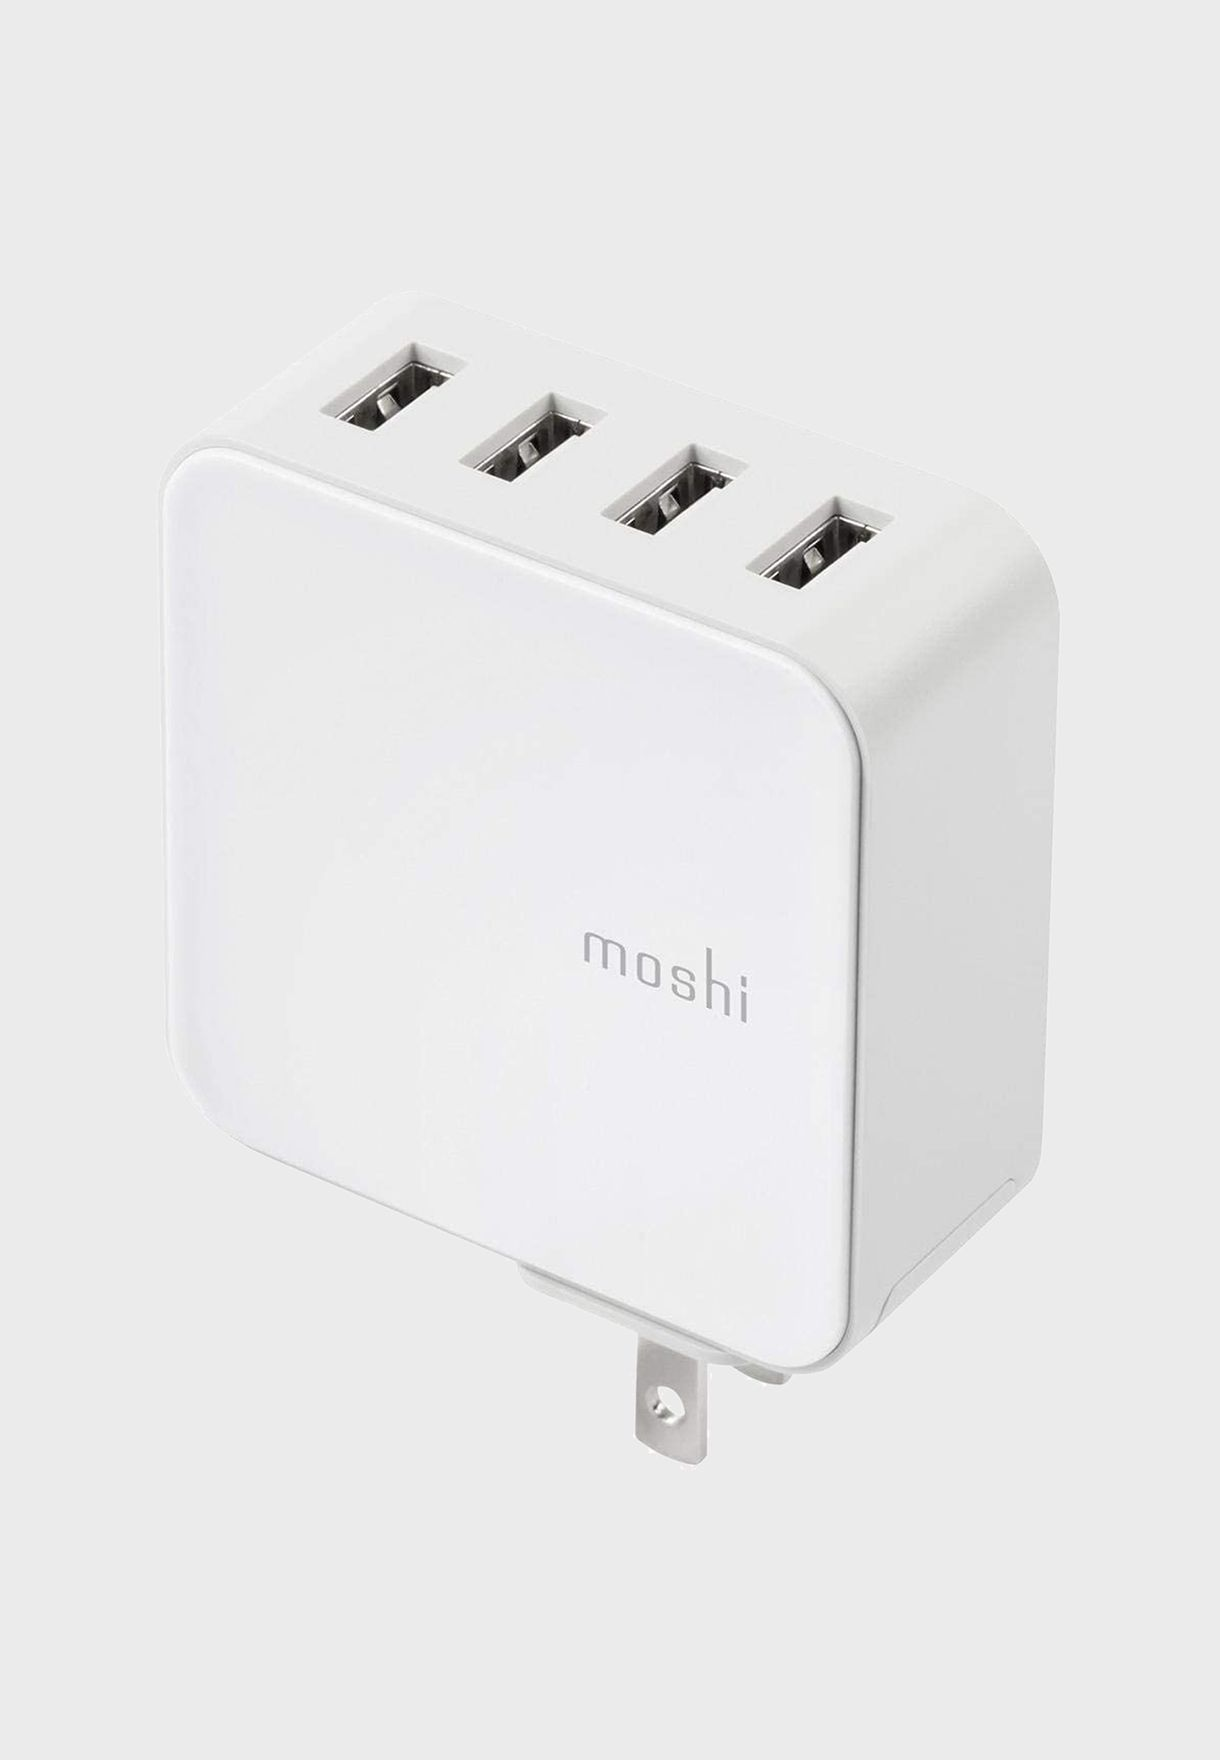 Moshi Progeo 4-Port Usb Wall Charger (35W) - EU &